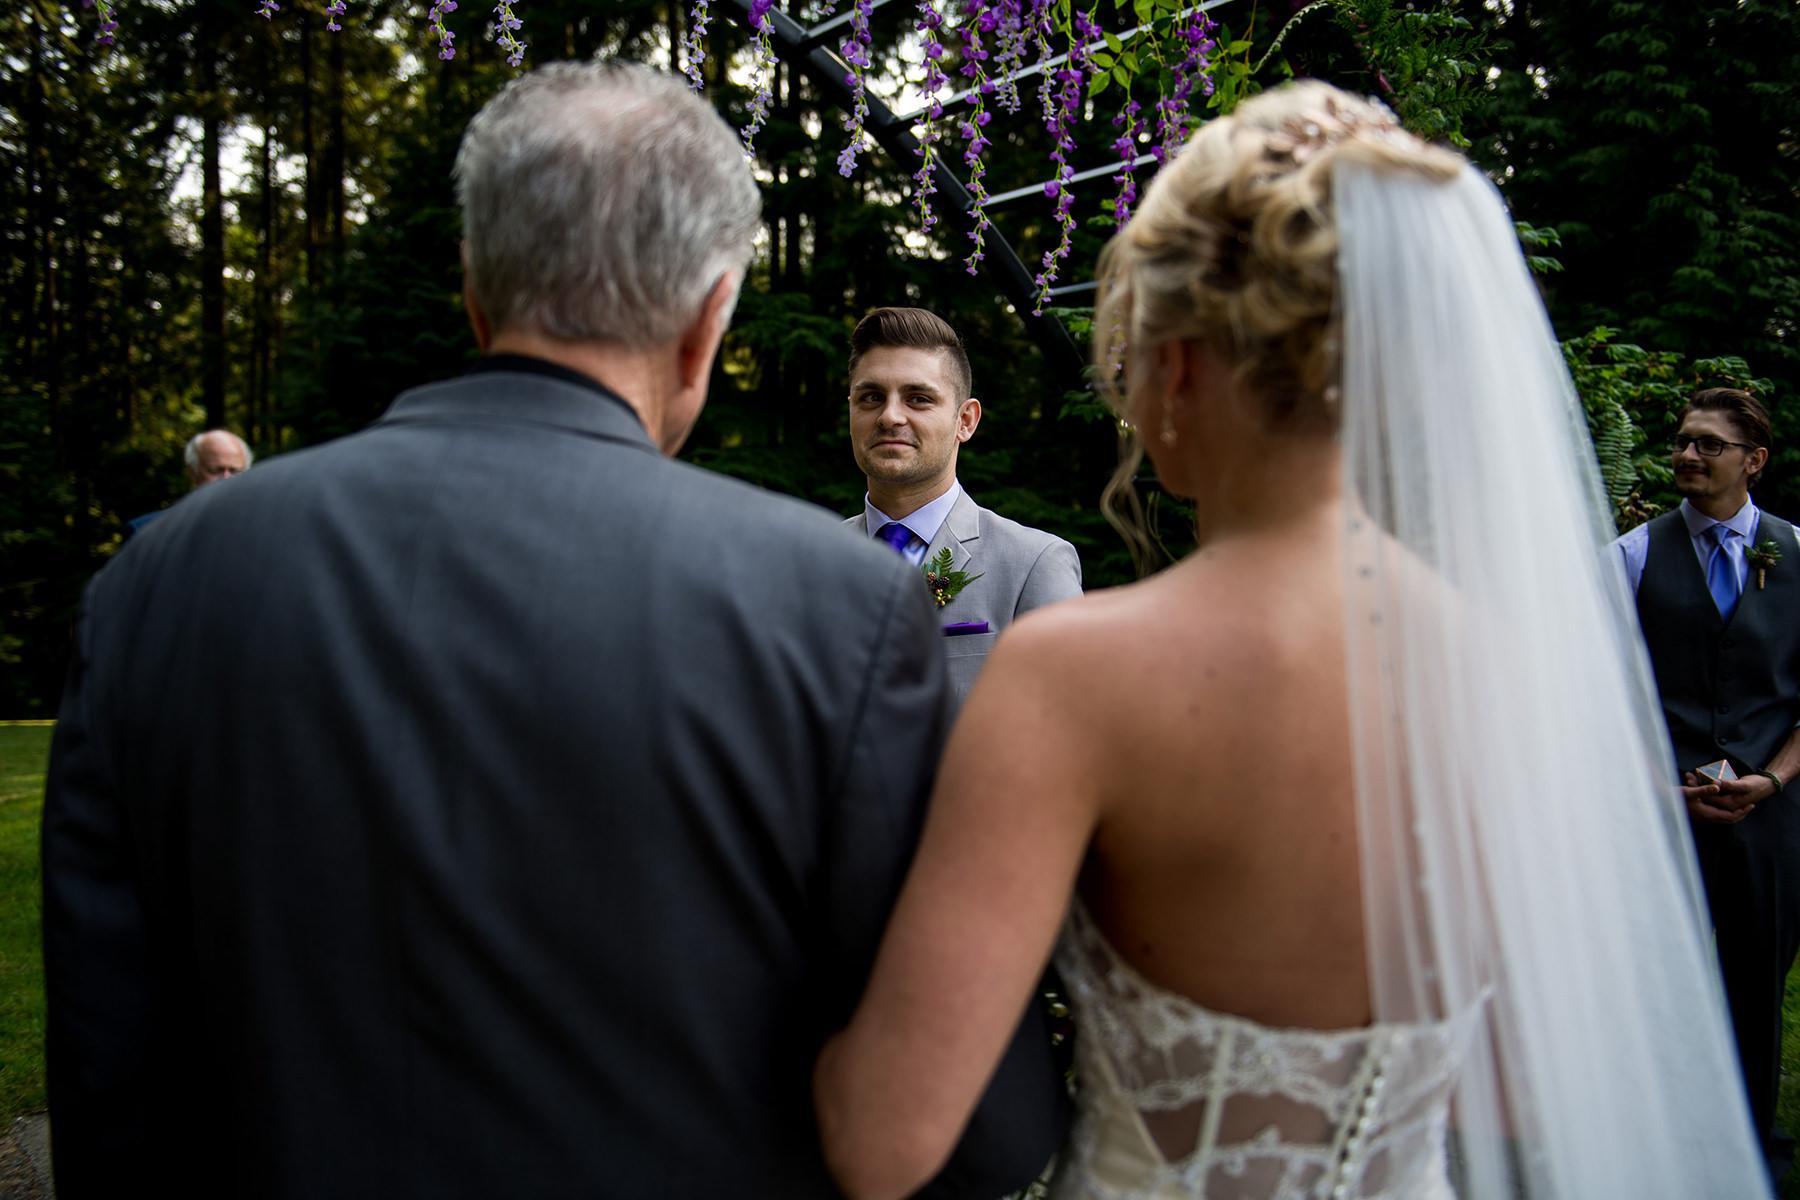 groom looking longingly at his bride